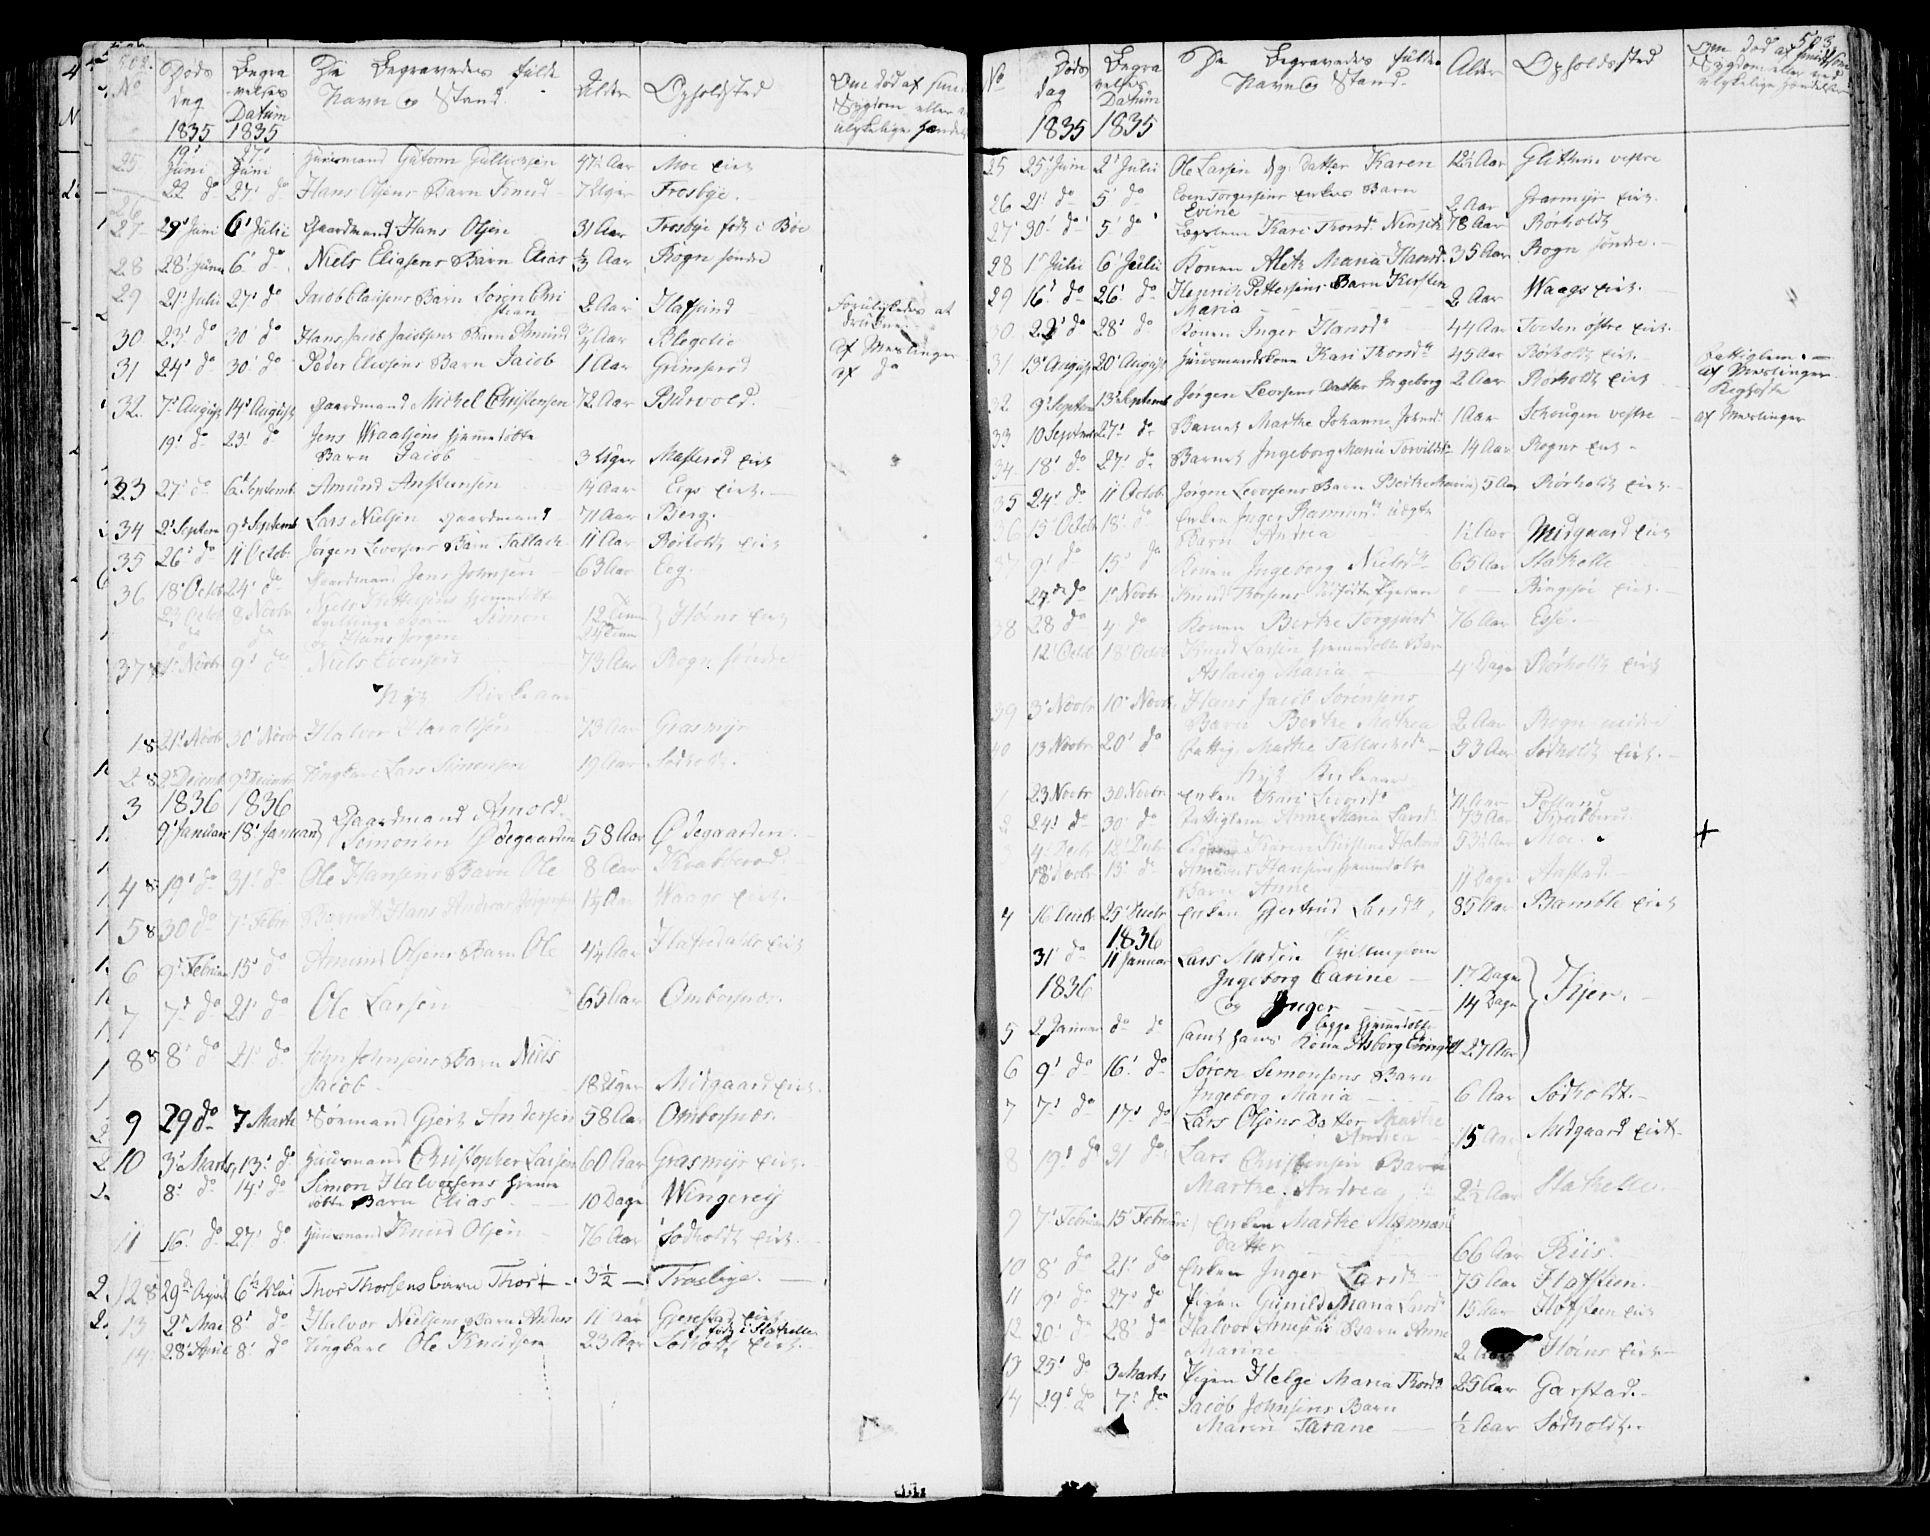 SAKO, Bamble kirkebøker, F/Fa/L0004: Ministerialbok nr. I 4, 1834-1853, s. 502-503